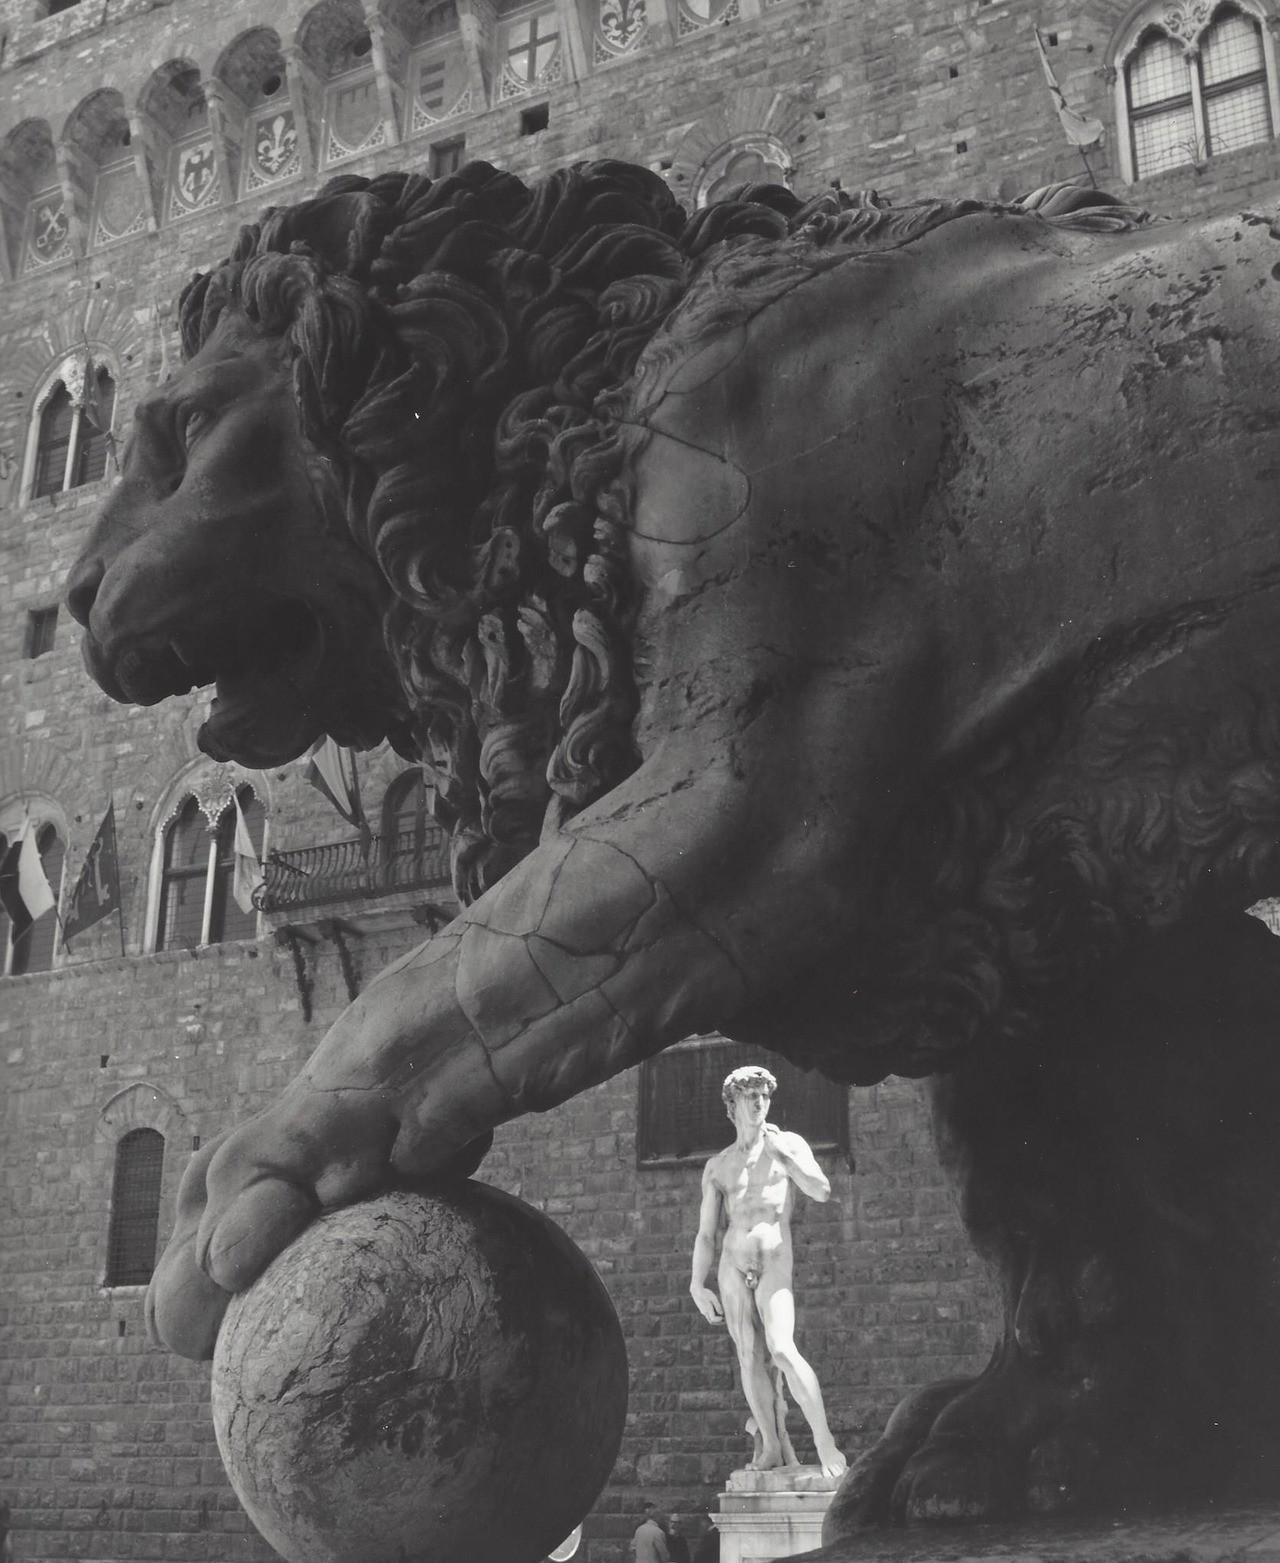 Флоренция, Италия, 1950-е. Фотограф Кис Шерер